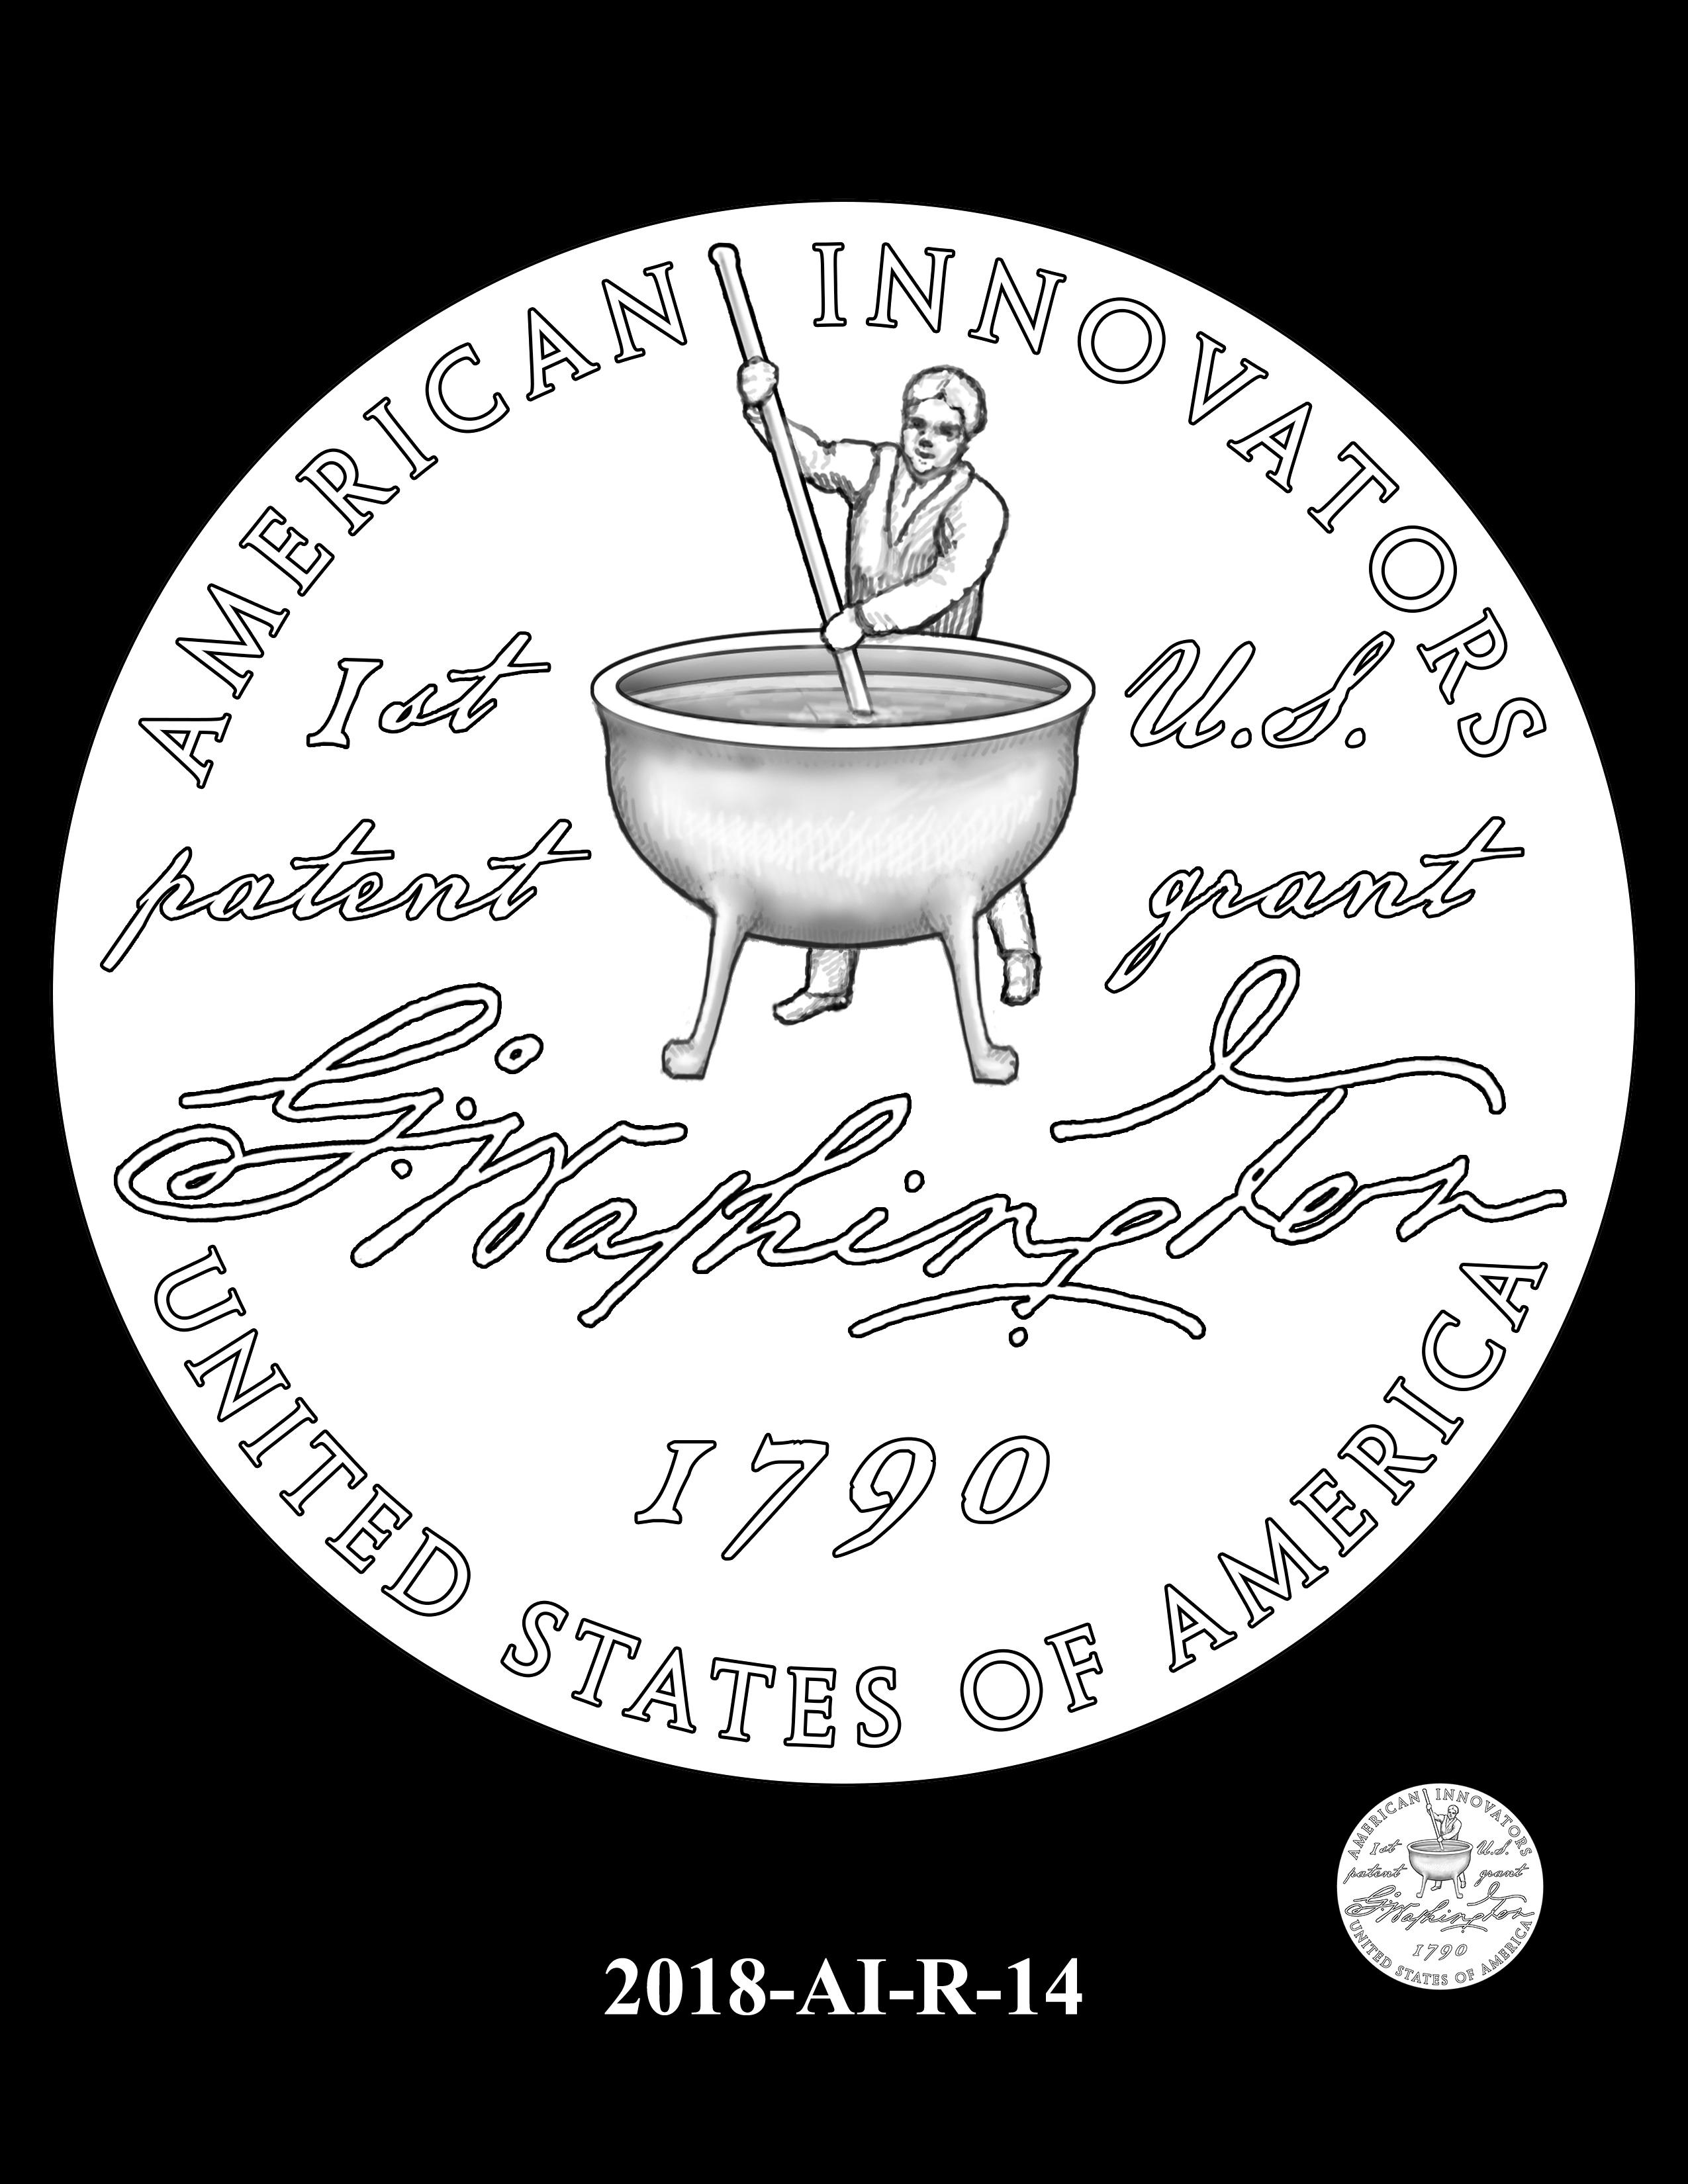 2018-AI-R-14 -- 2018 American Innovation $1 Coin